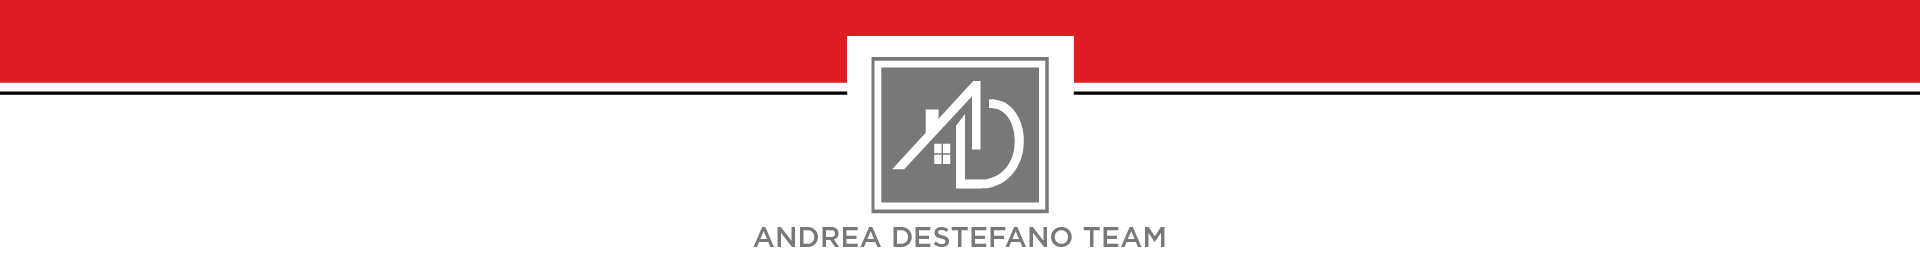 Destefano-Web-Header-Adj-Ctr